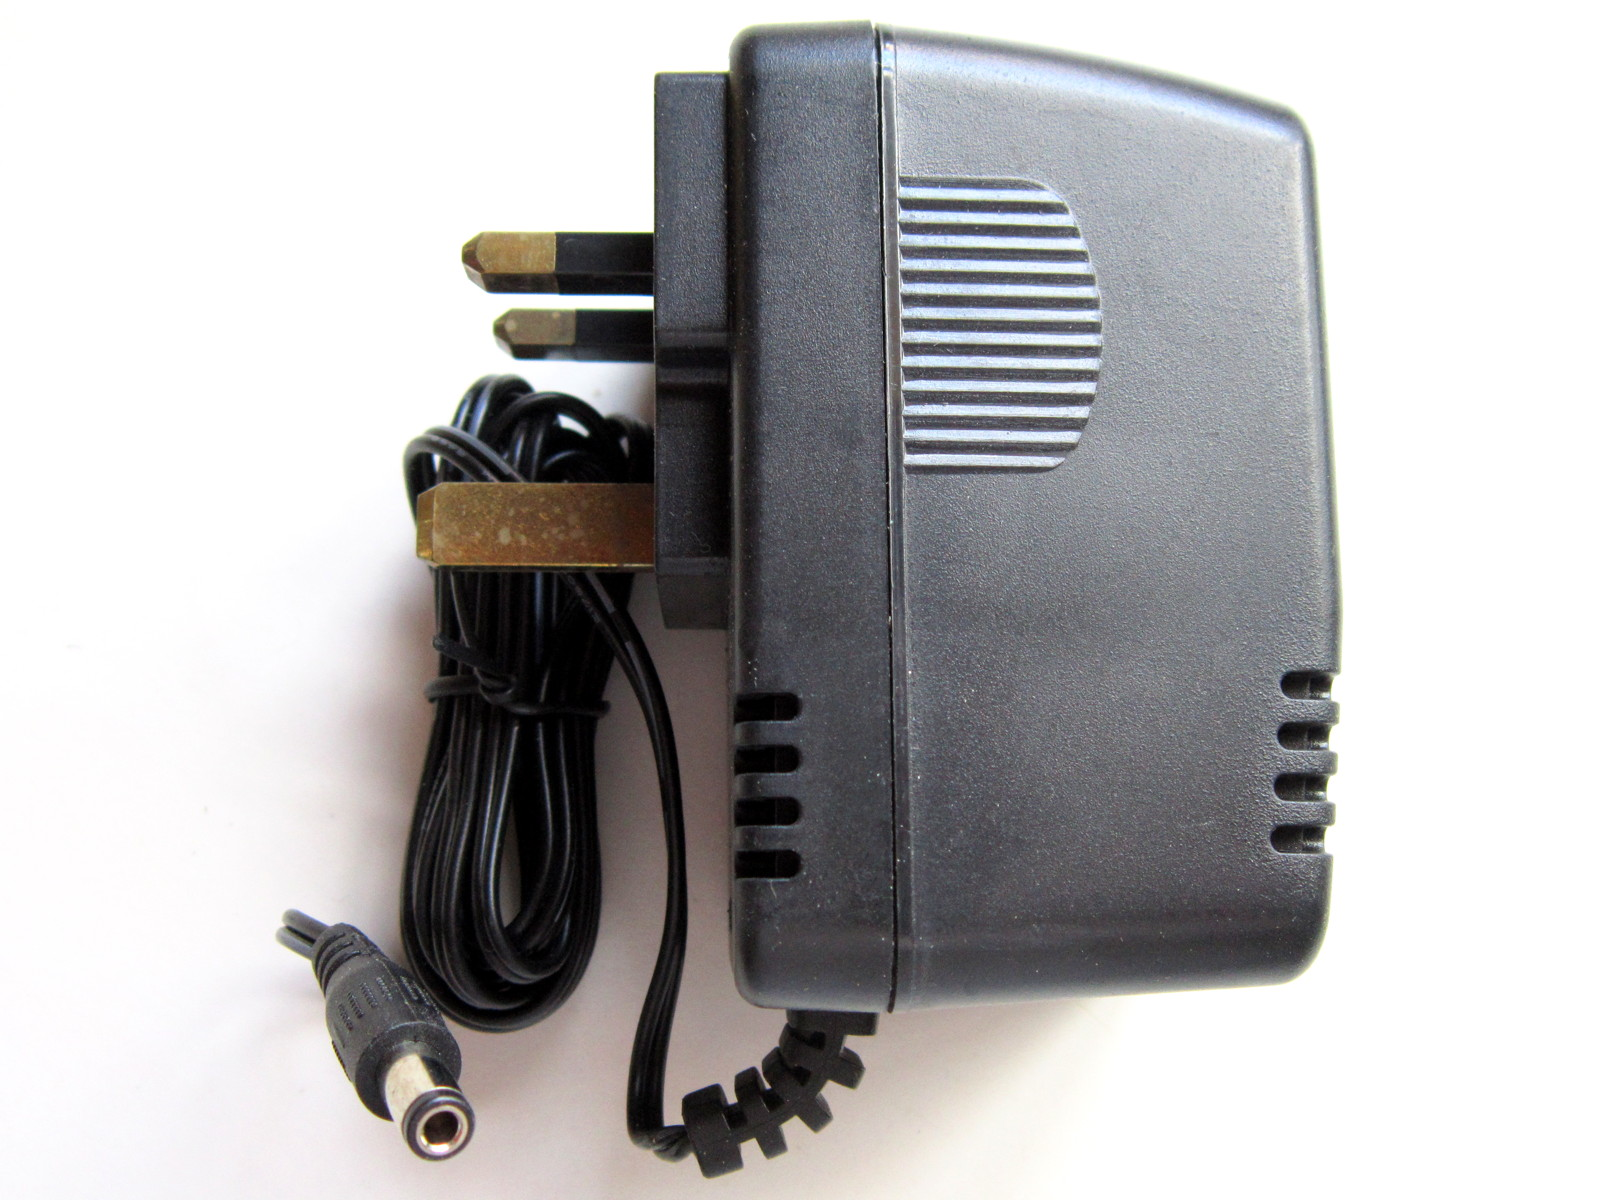 Behringer Psu7 Uk 240v Uk Replacement Power Supply For